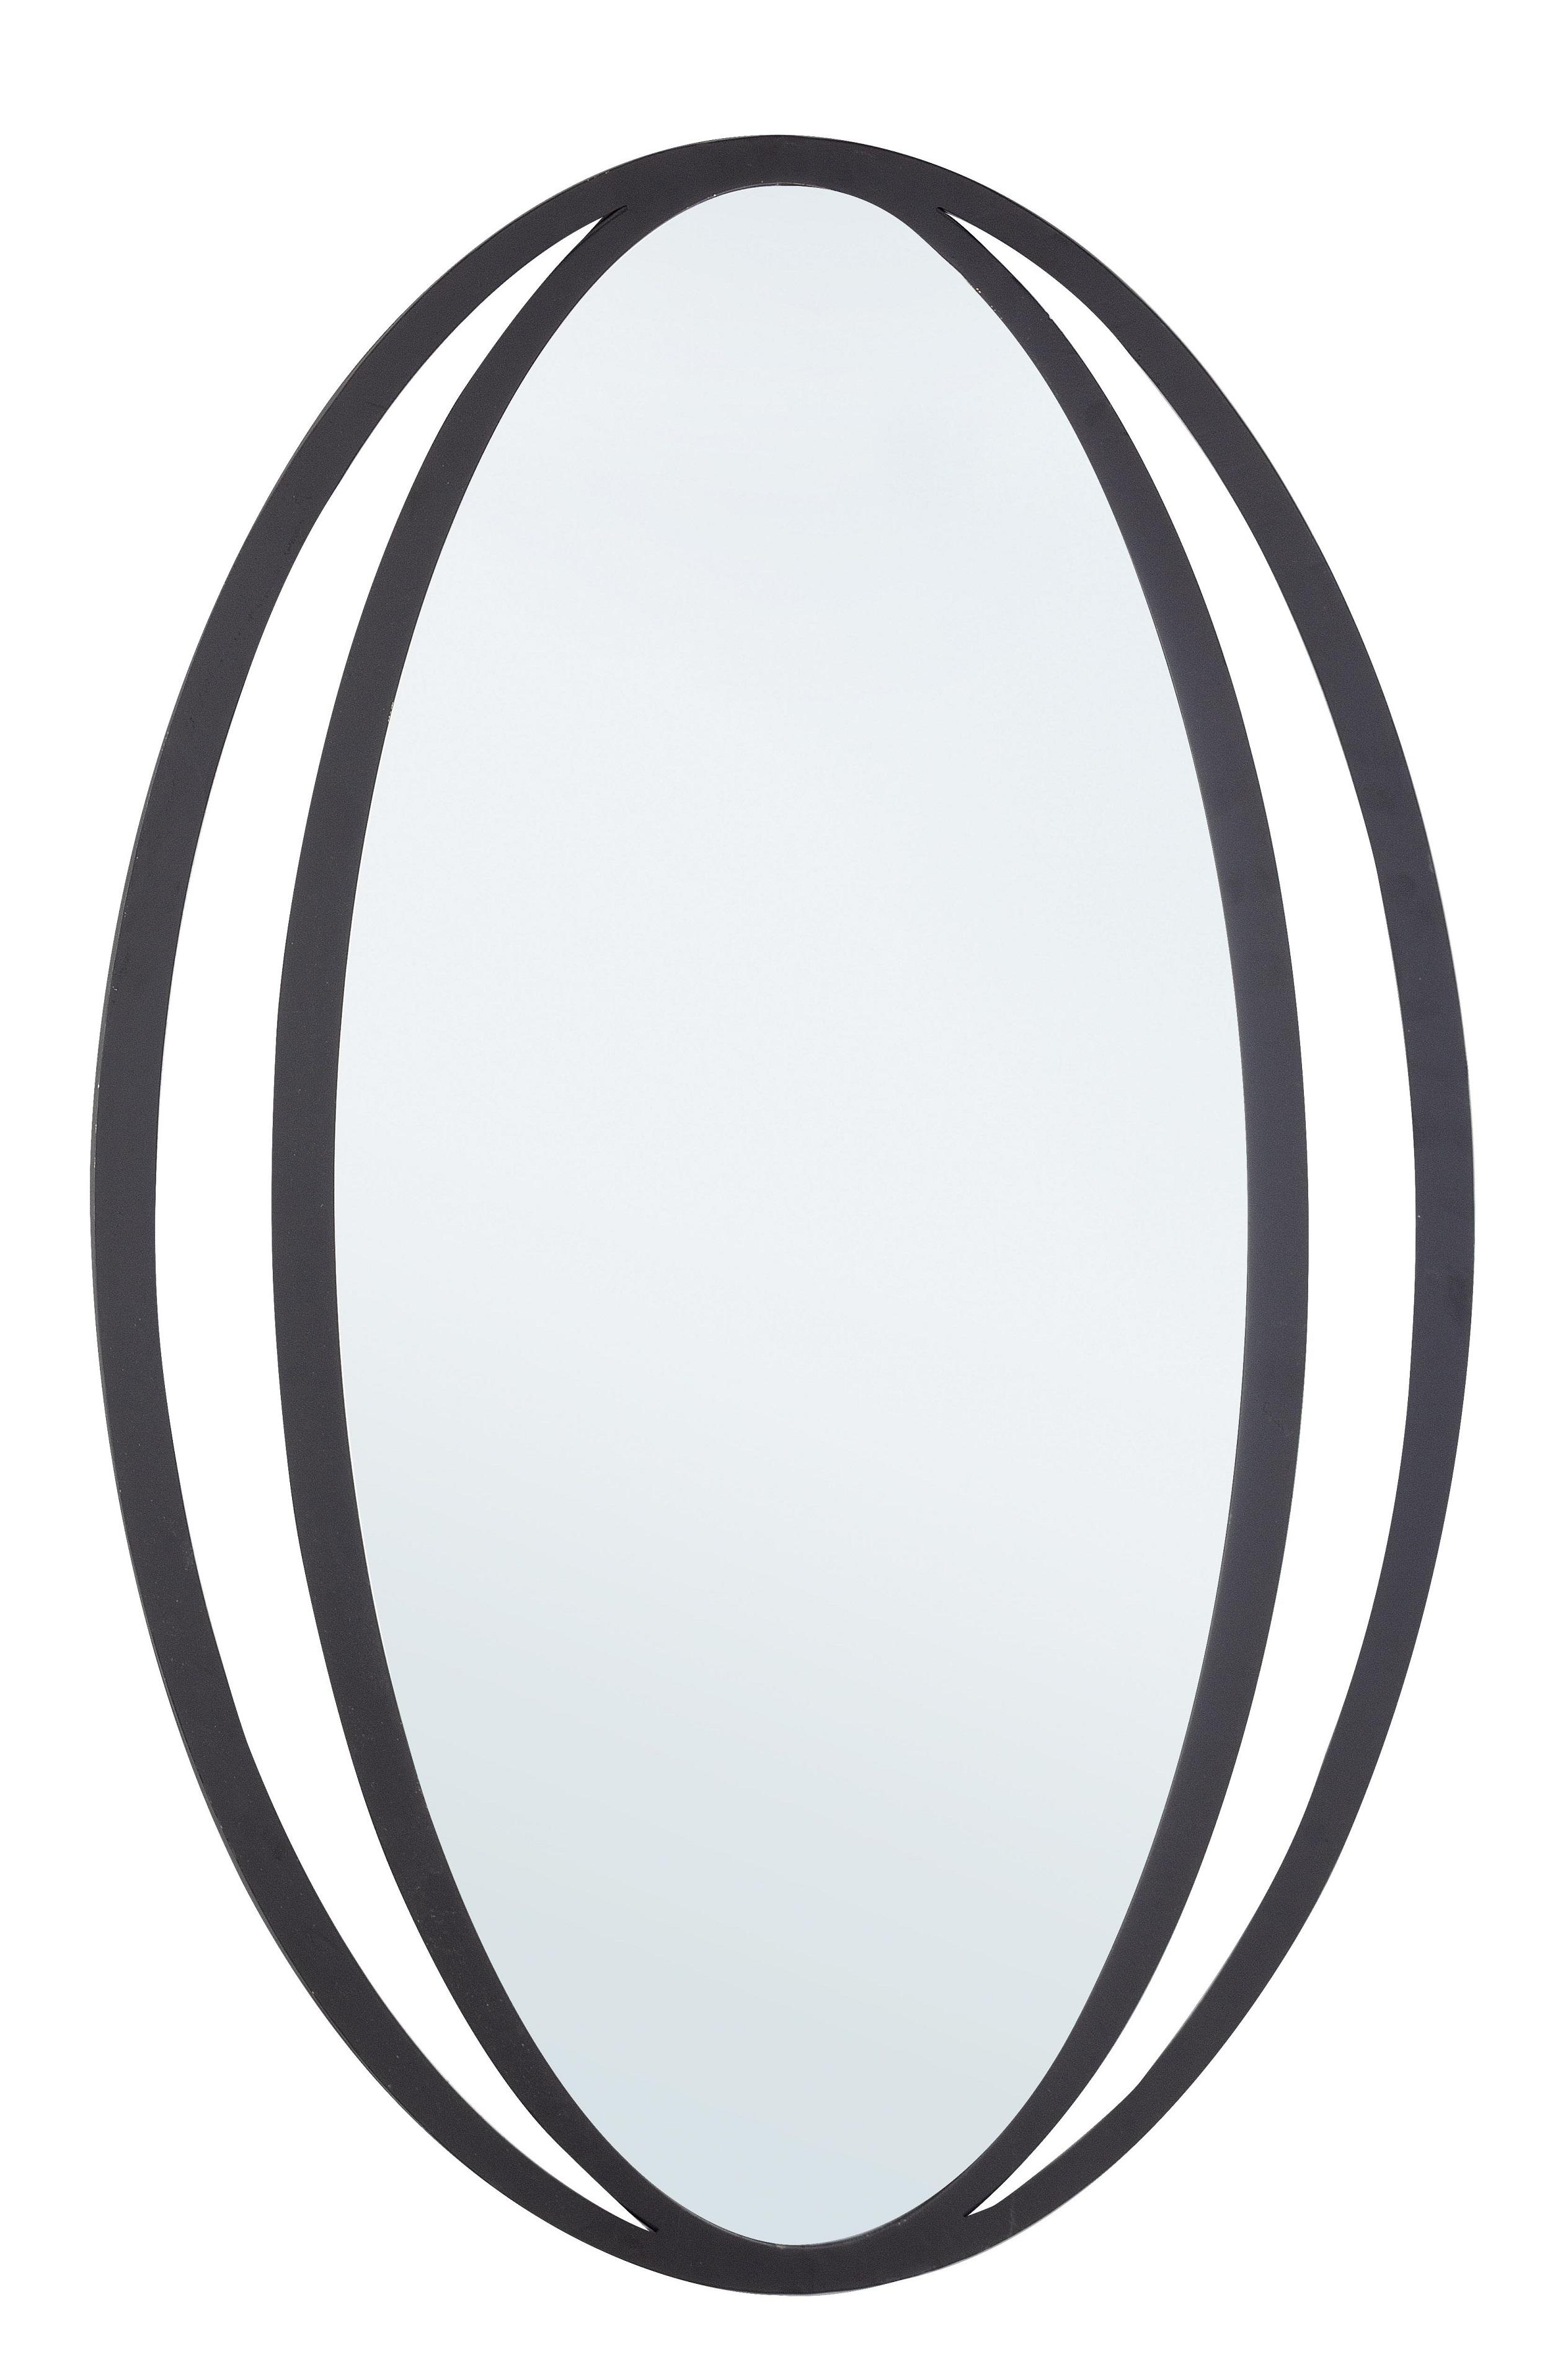 Oglinda decorativa cu rama metalica Nabila Negru, L51xl80 cm